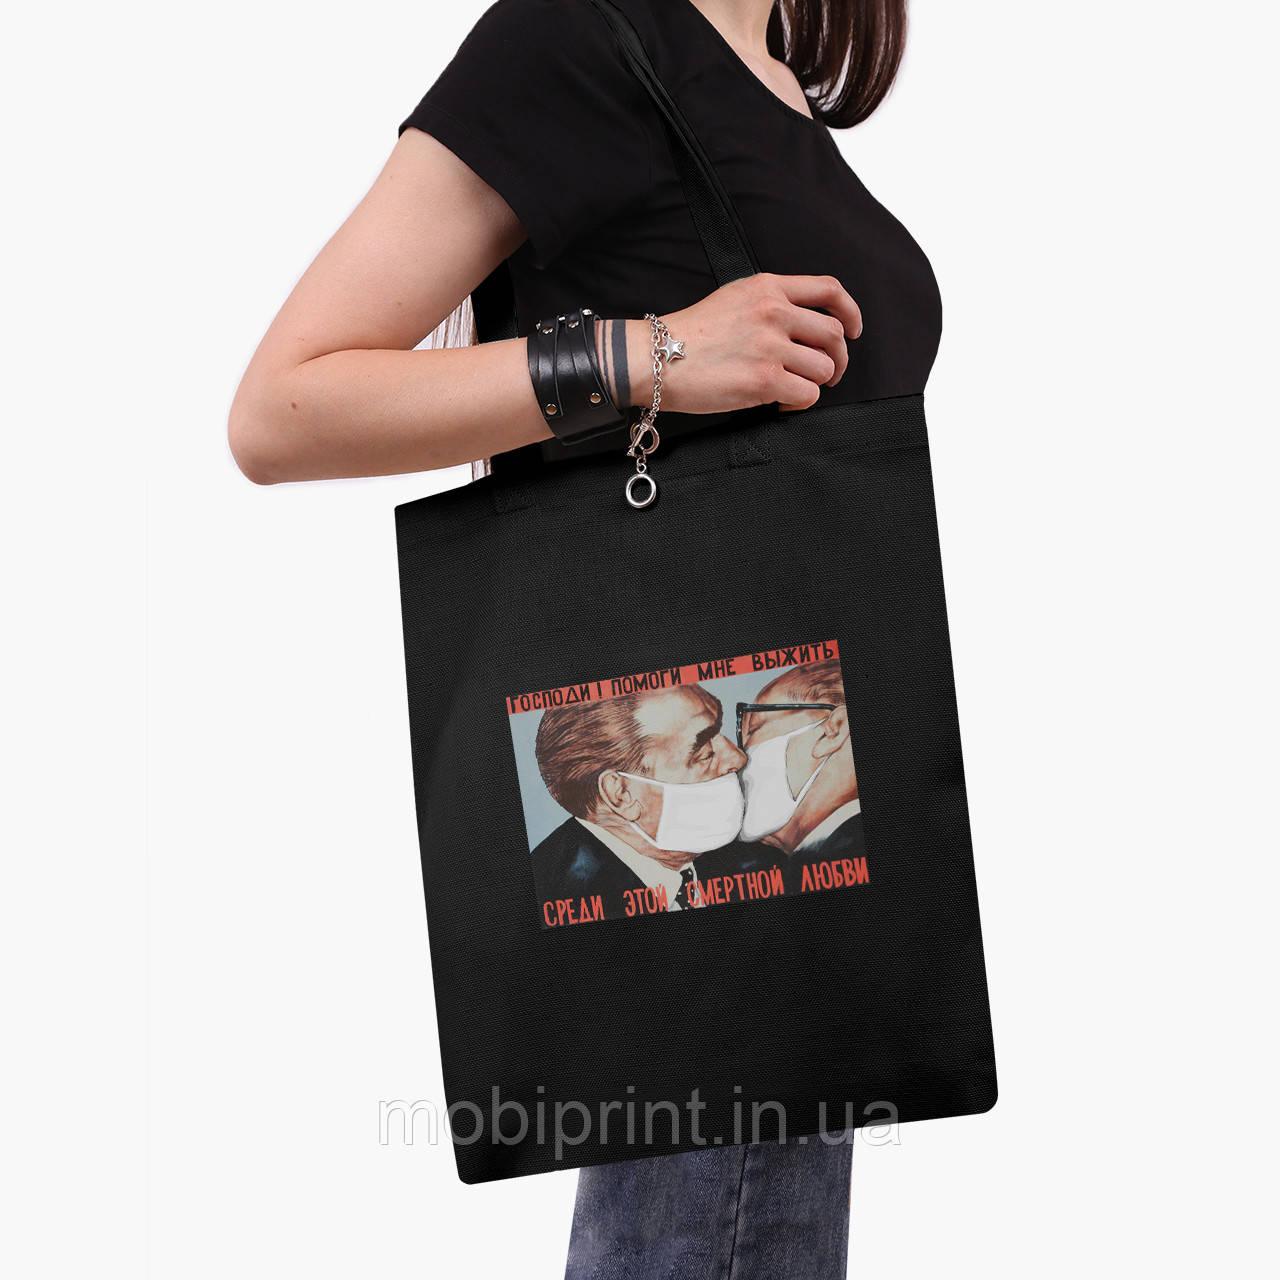 Эко сумка шоппер черная Брежнев поцелуй (Brezhnev kiss) (9227-1424-2) экосумка шопер 41*35 см